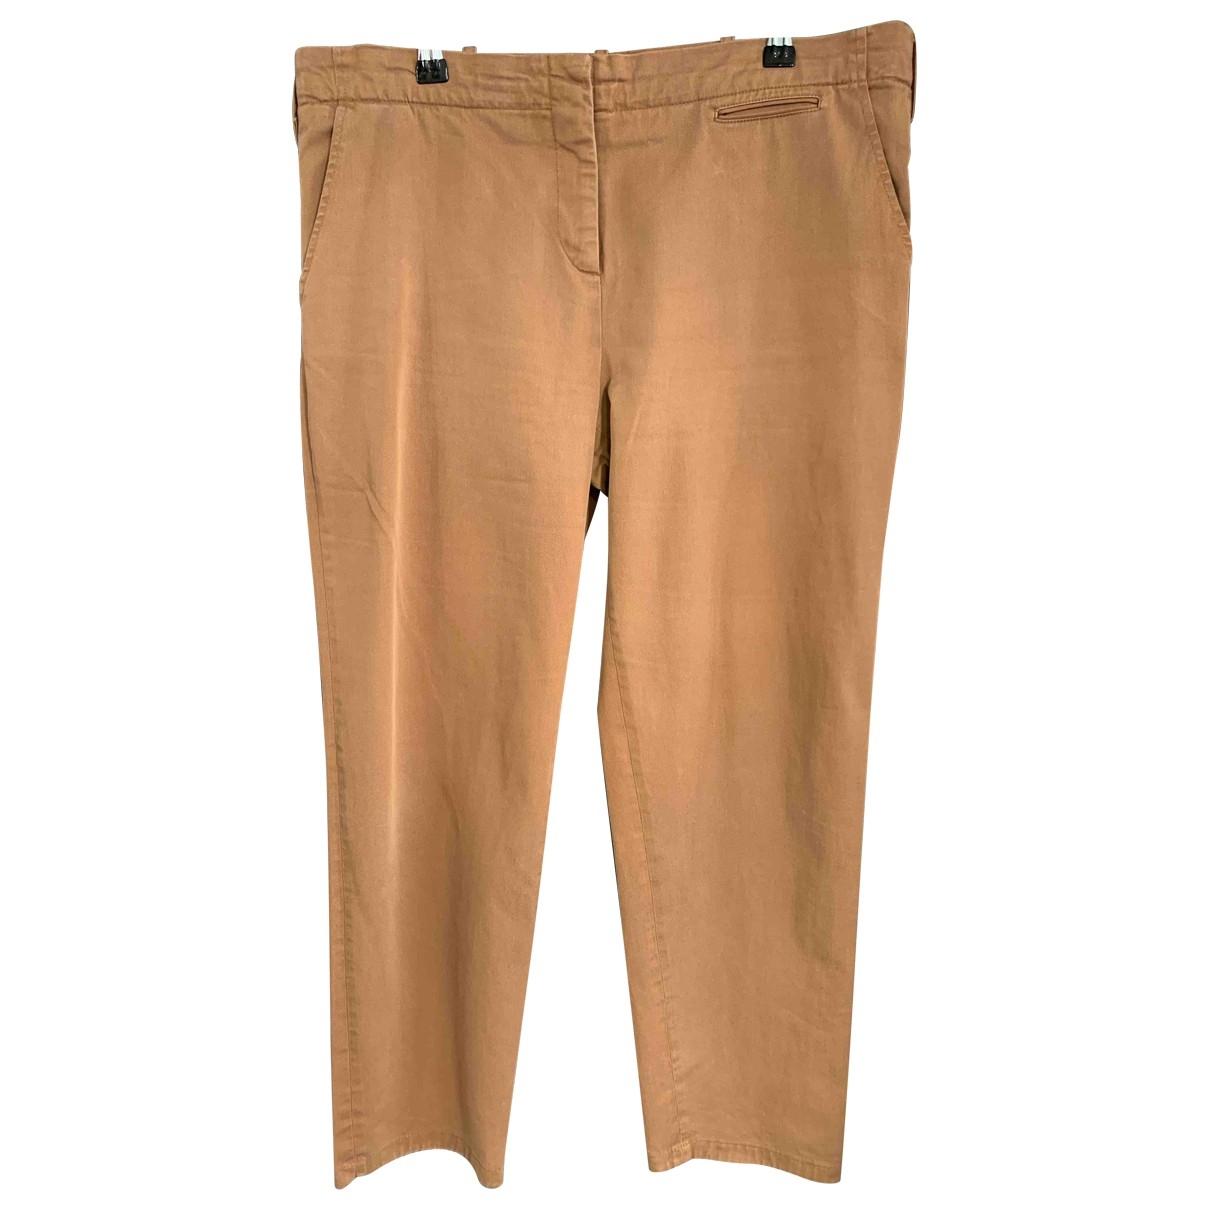 Gerard Darel \N Beige Cotton Trousers for Women 44 FR